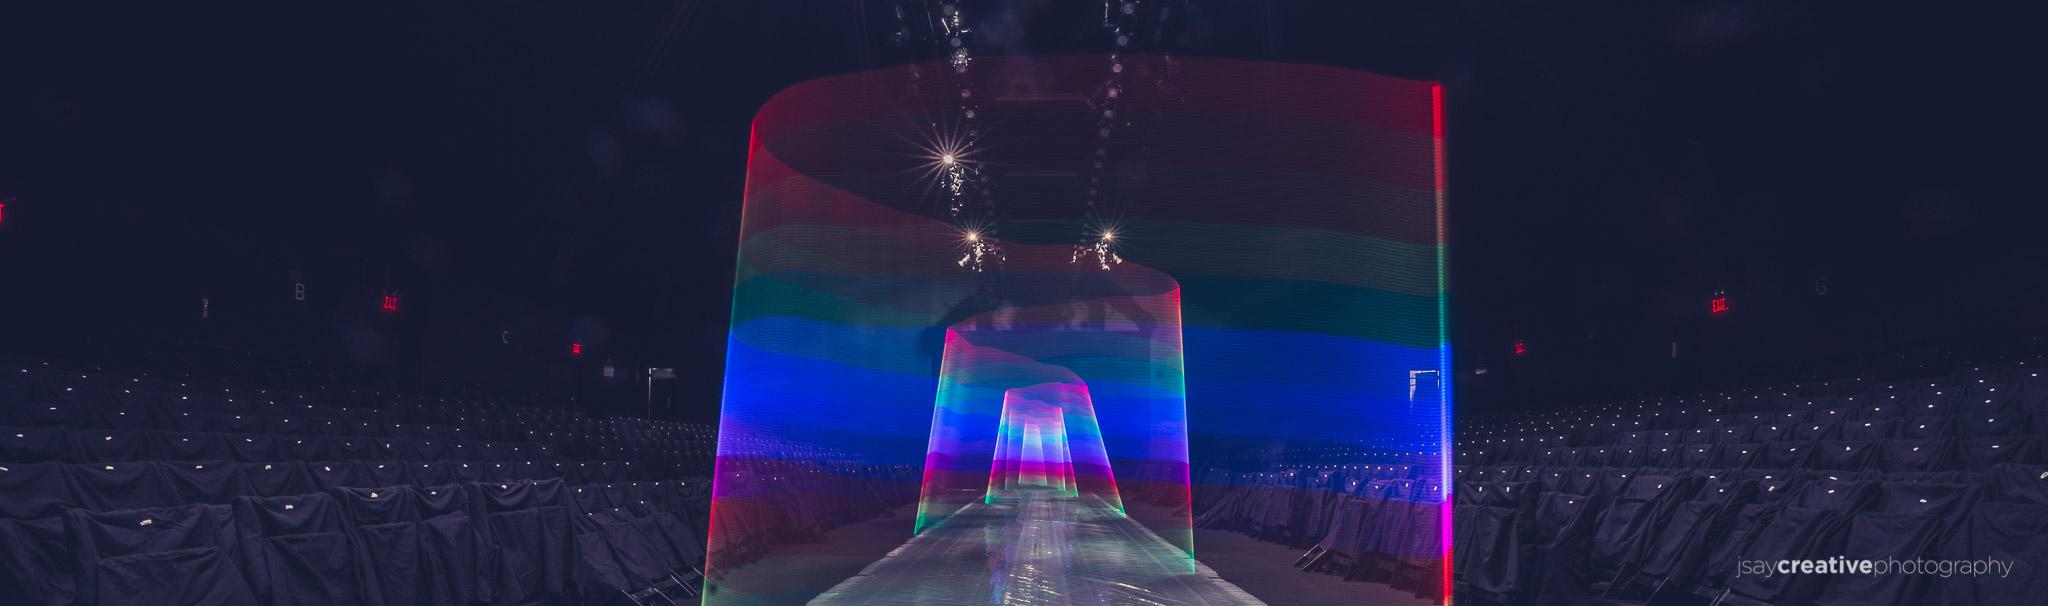 Lighting Up The Runway